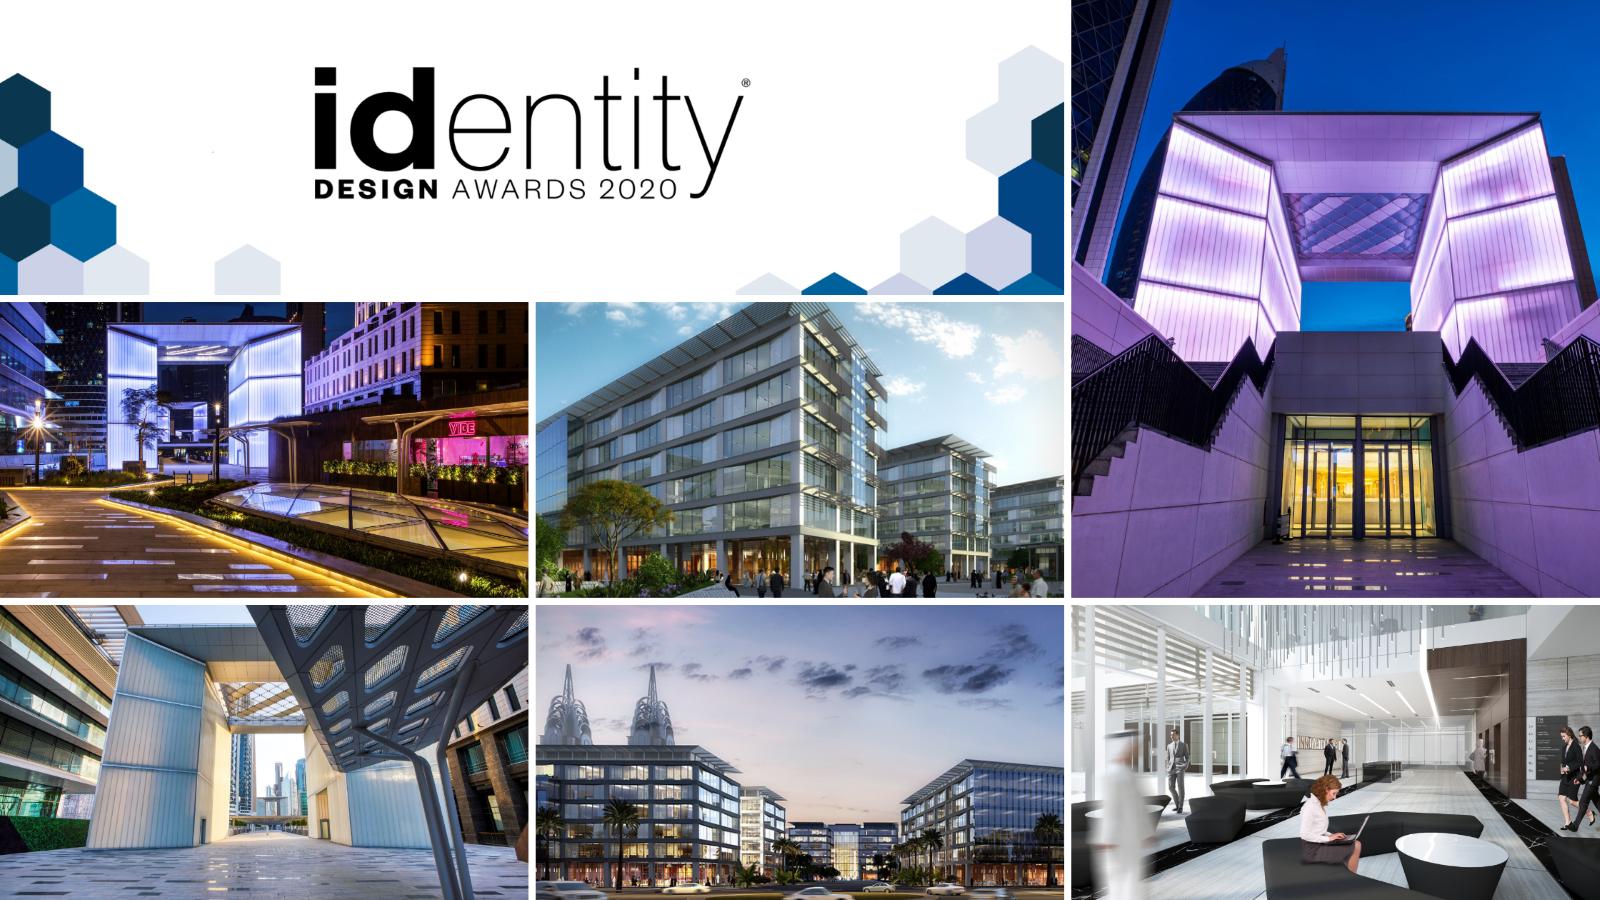 RMJM Dubai Make identity Design Awards Shortlist Twice!